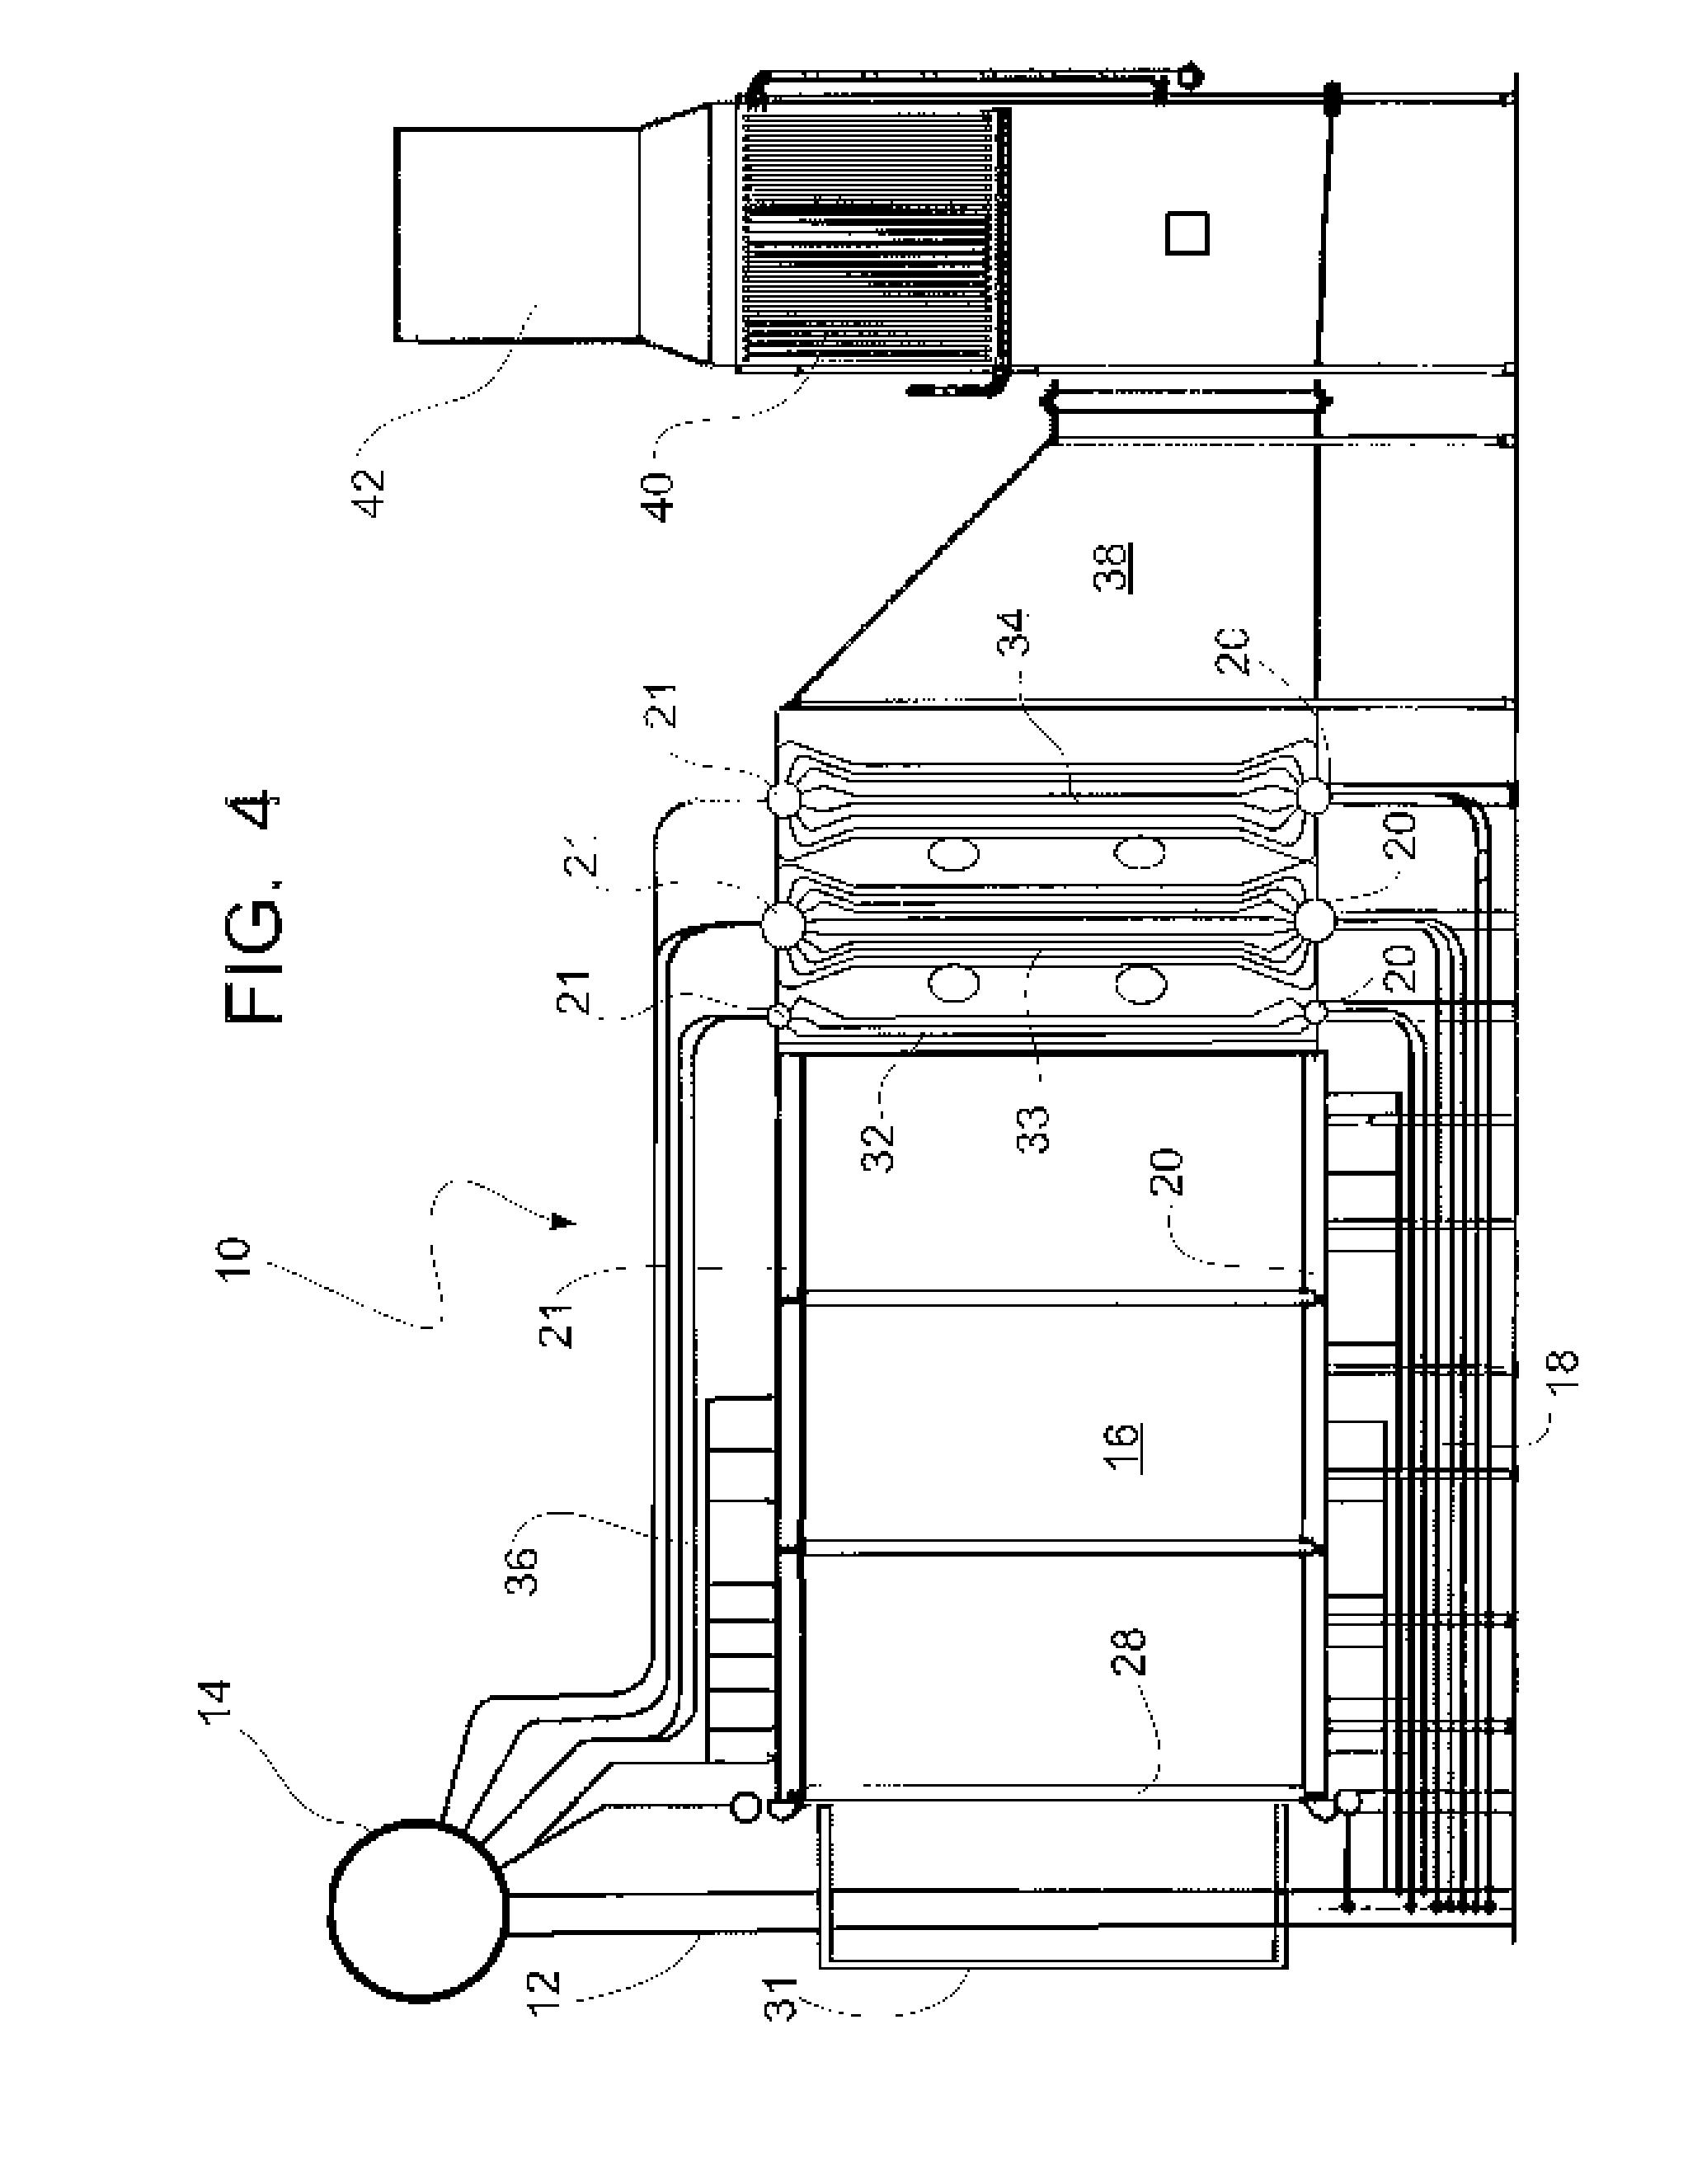 Mcdonnell Miller Boiler Water Feeder Wiring Diagrams